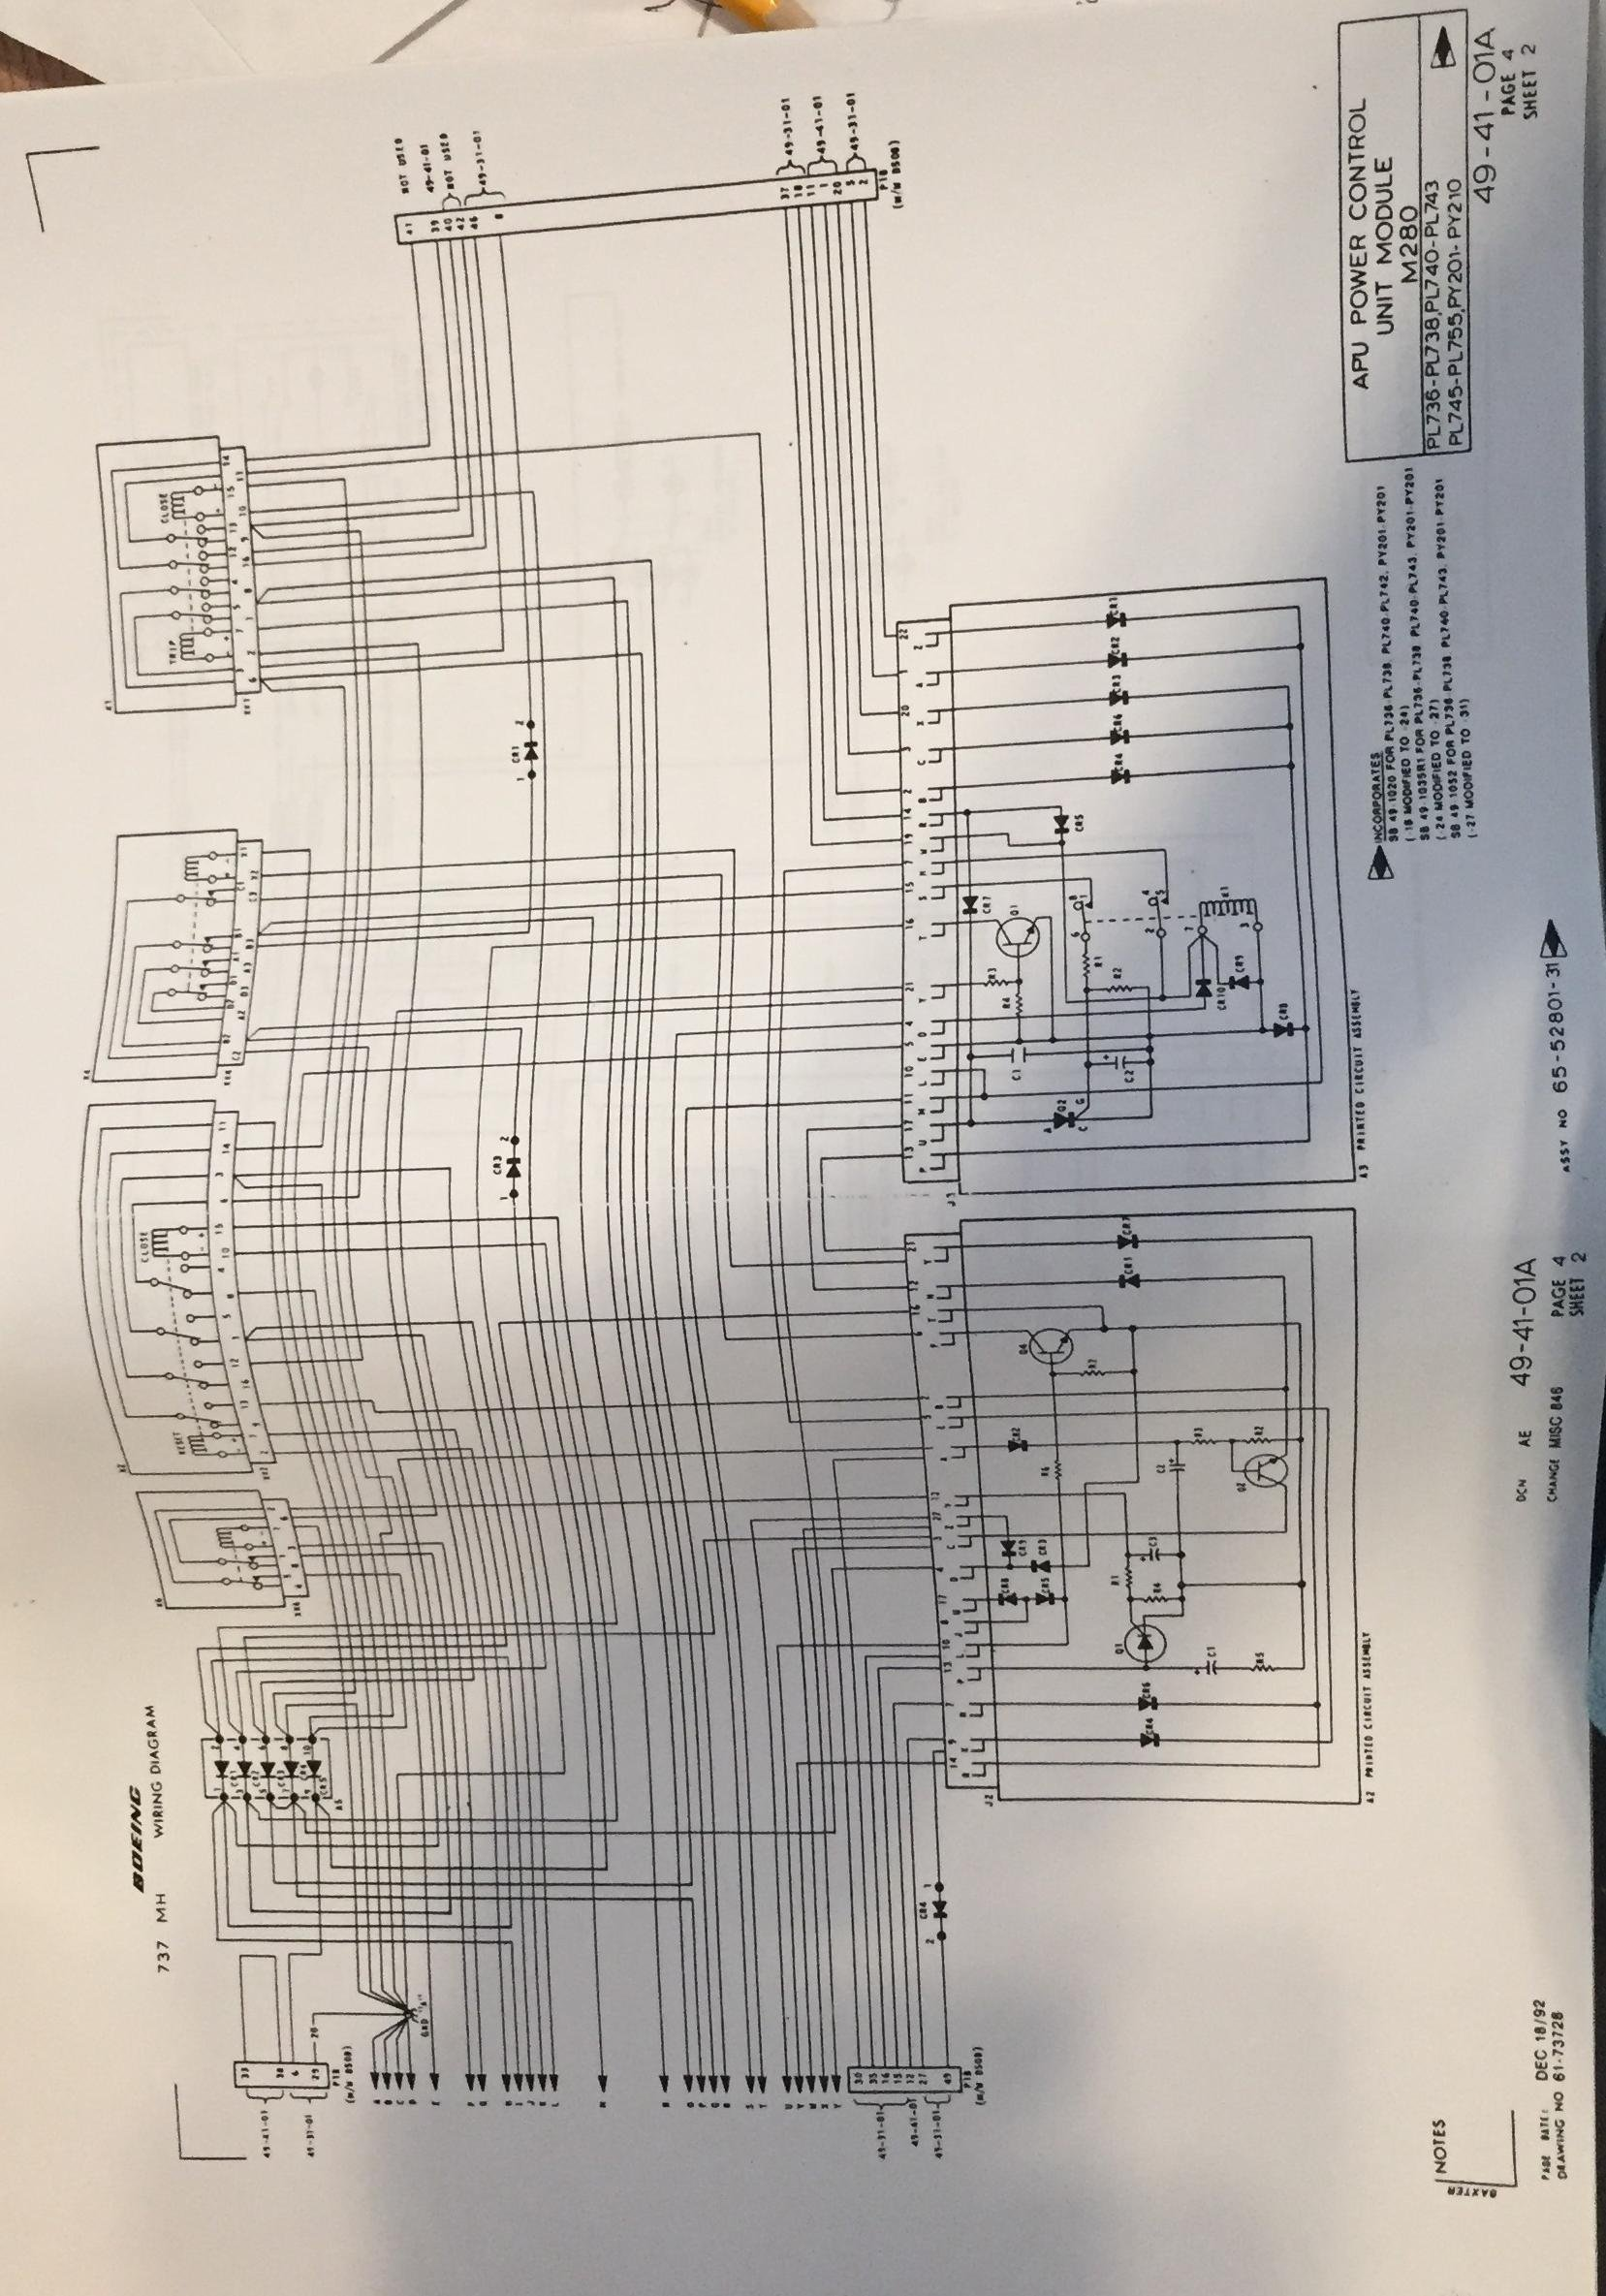 boeing 737 wh wiring diagram manual volume 2 of 2 boeing Boeing Wiring Diagram